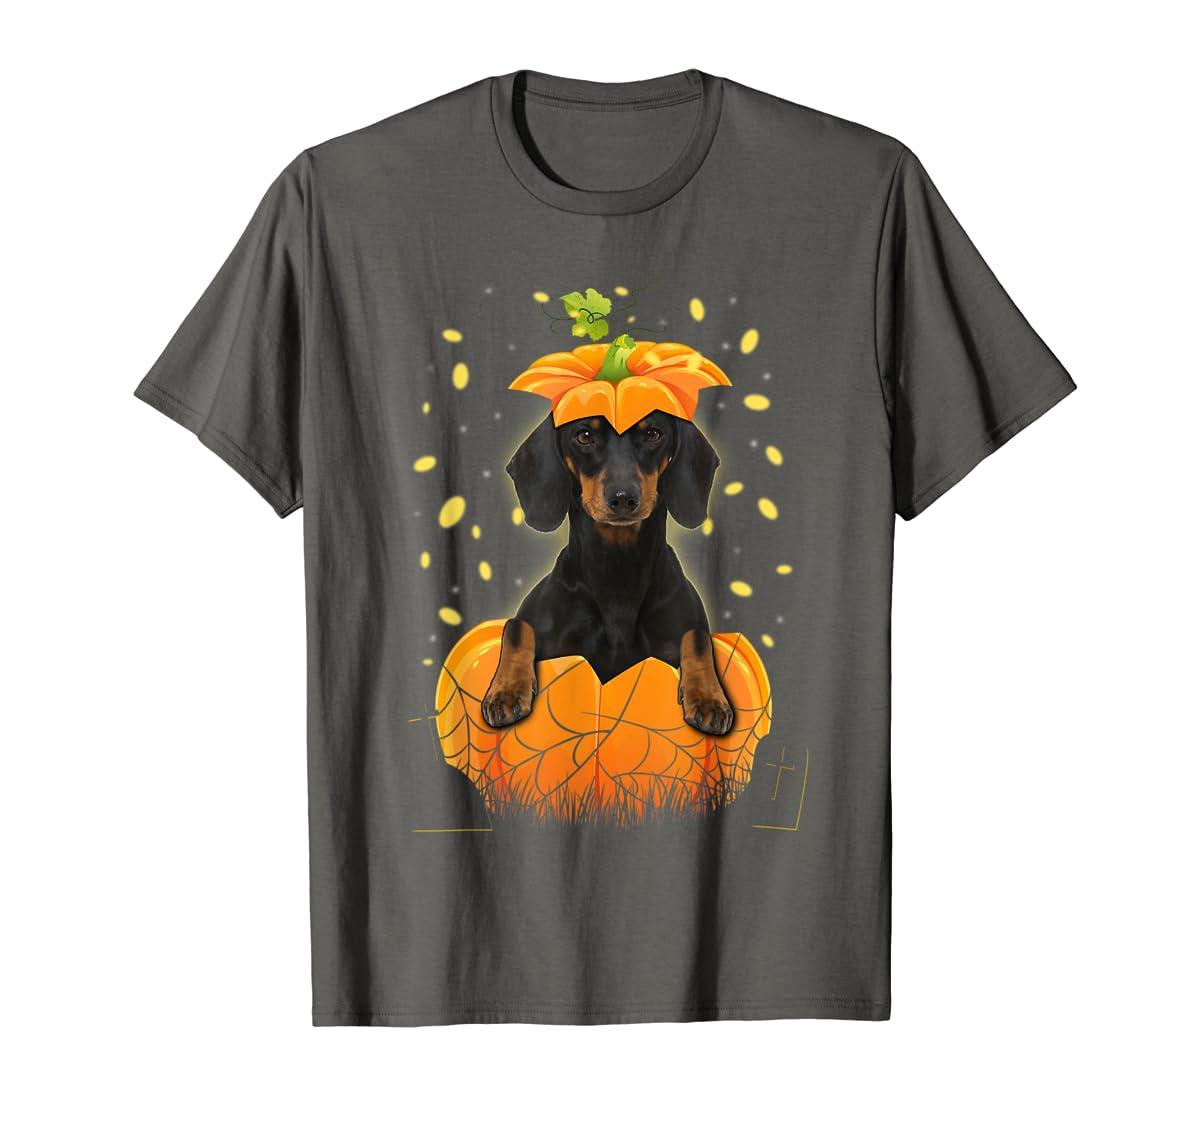 Happy Halloween Funny Dachshund Pumpkin T-Shirt-Men's T-Shirt-Dark Heather